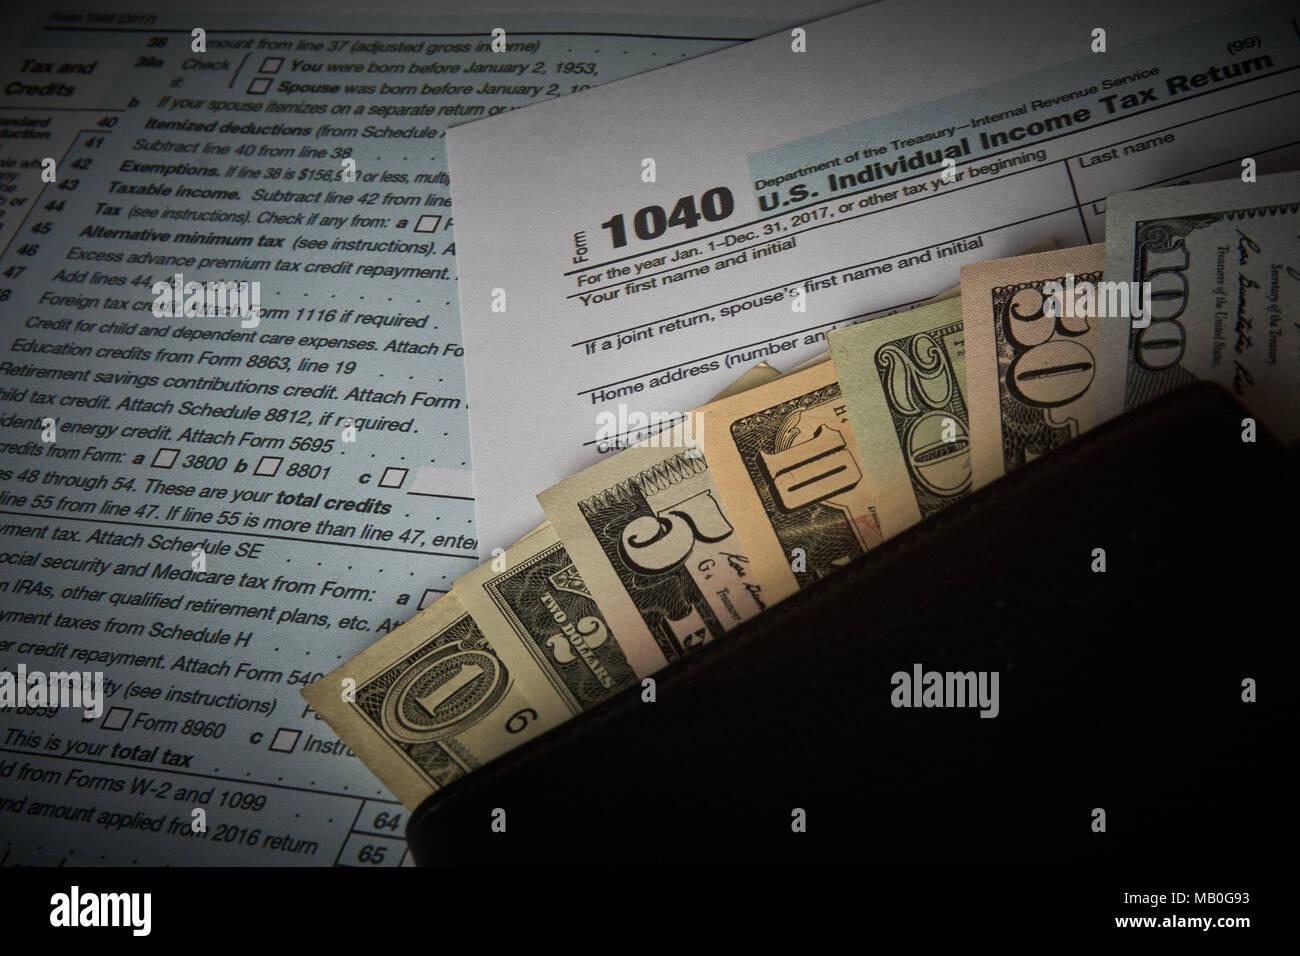 1040 Tax Form Stock Photos & 1040 Tax Form Stock Images - Alamy